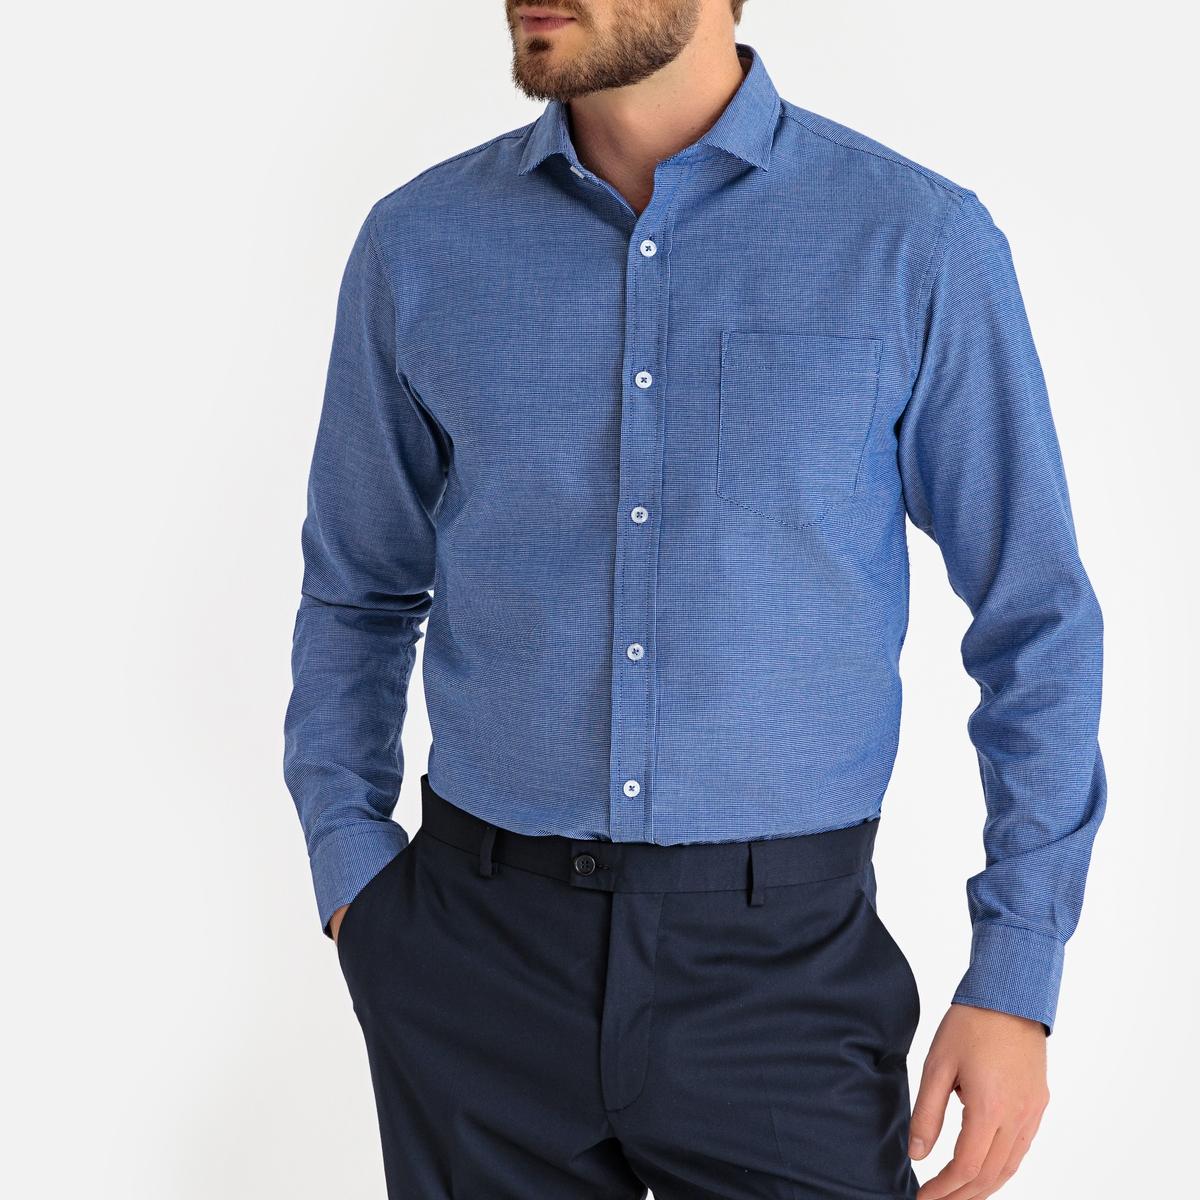 Camisa recta con microcuadros, manga larga